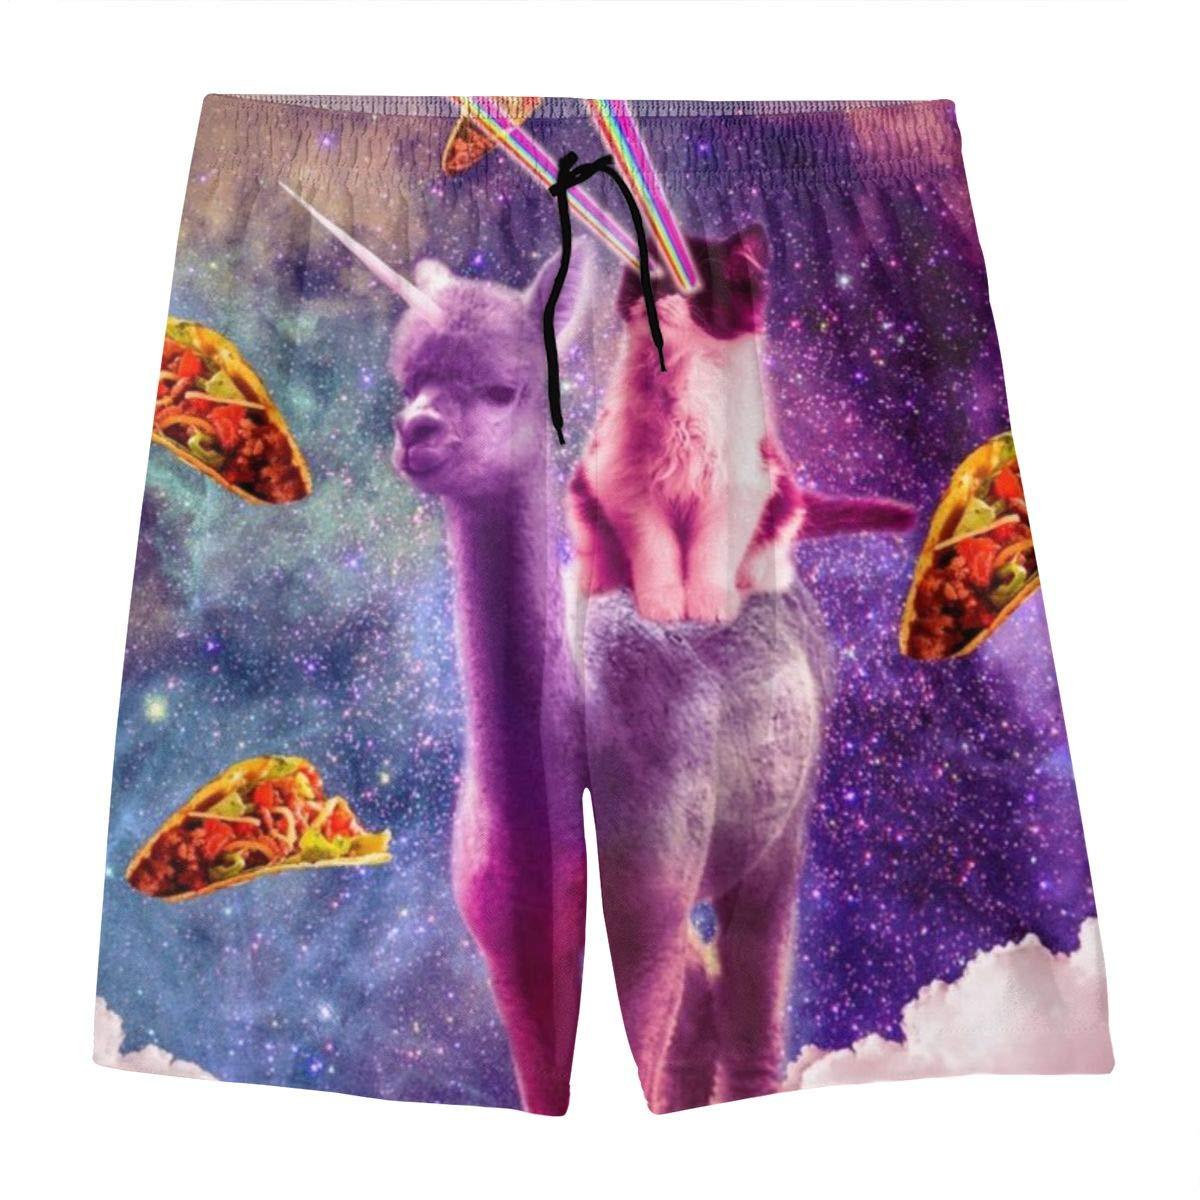 COLSHOORTS Cosmic Cat Riding Alpaca Llama Unicorn Pizza Taco Mens Hawaiian Boardshorts Quick Dry Swimsuit 3D Printed Elastic Beach Short Aloha Short with Pocket